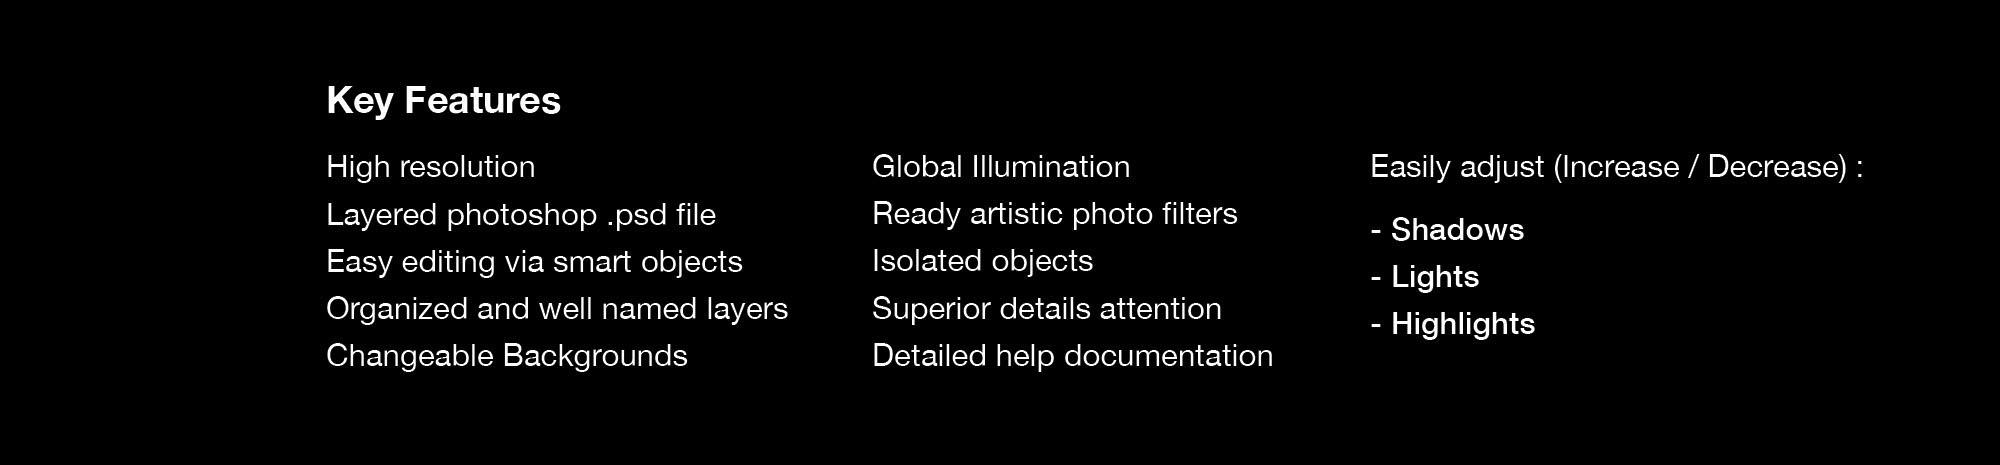 A4 Folder Mockup - Features